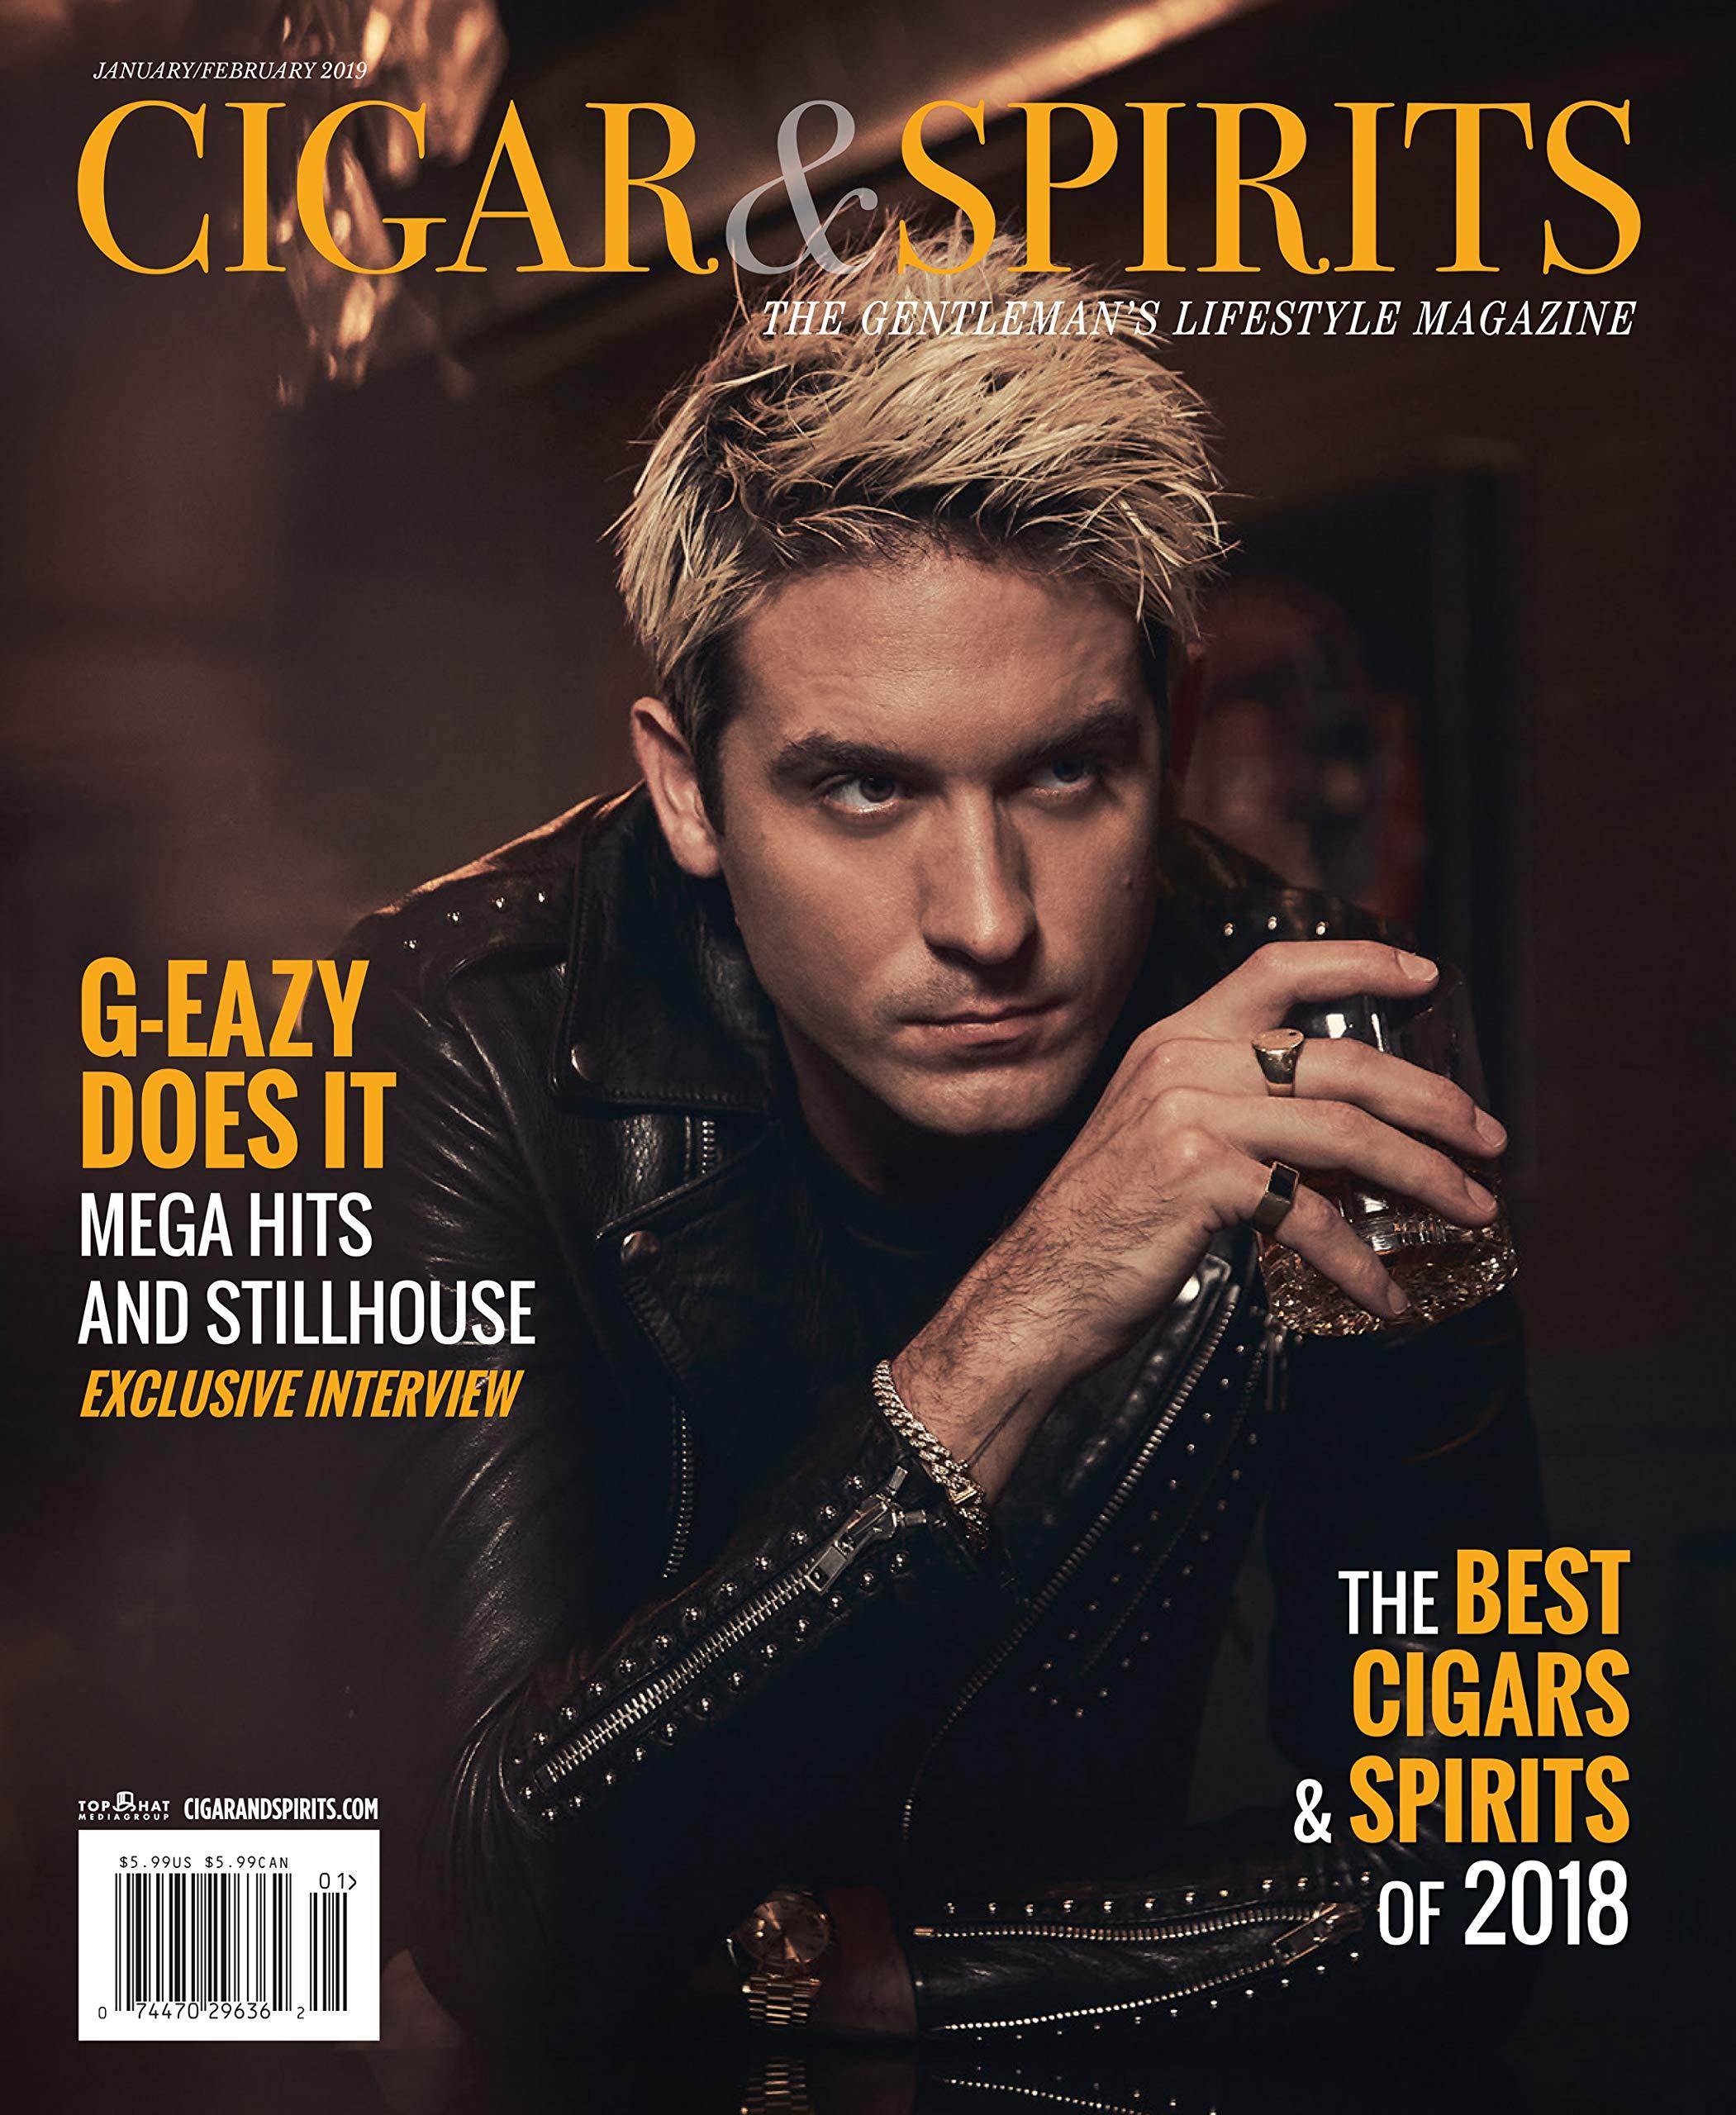 Cigars & Spirits Magazine (January/February, 2019) G-Eazy